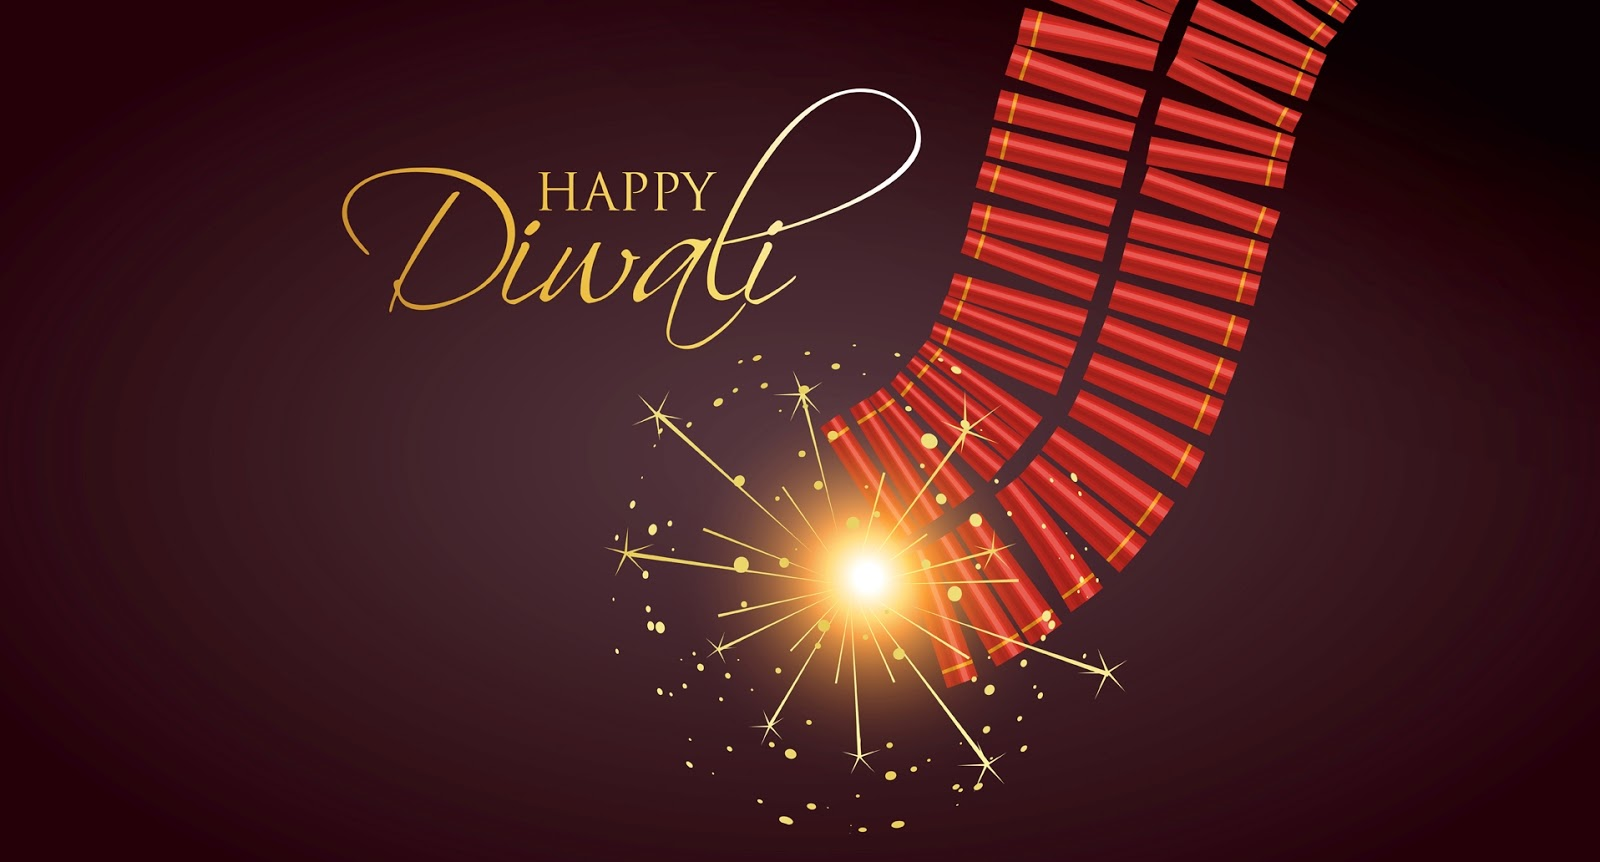 Choti Diwali HD Wallpapers with Crackers